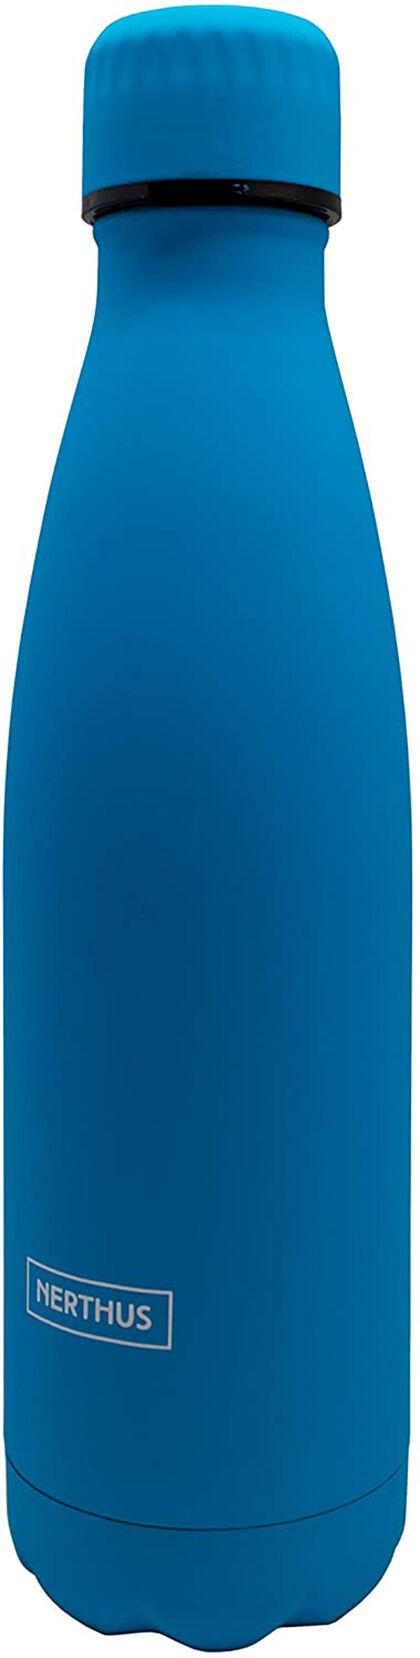 Ampolla Nerthus Doble capa 500 ml Blau